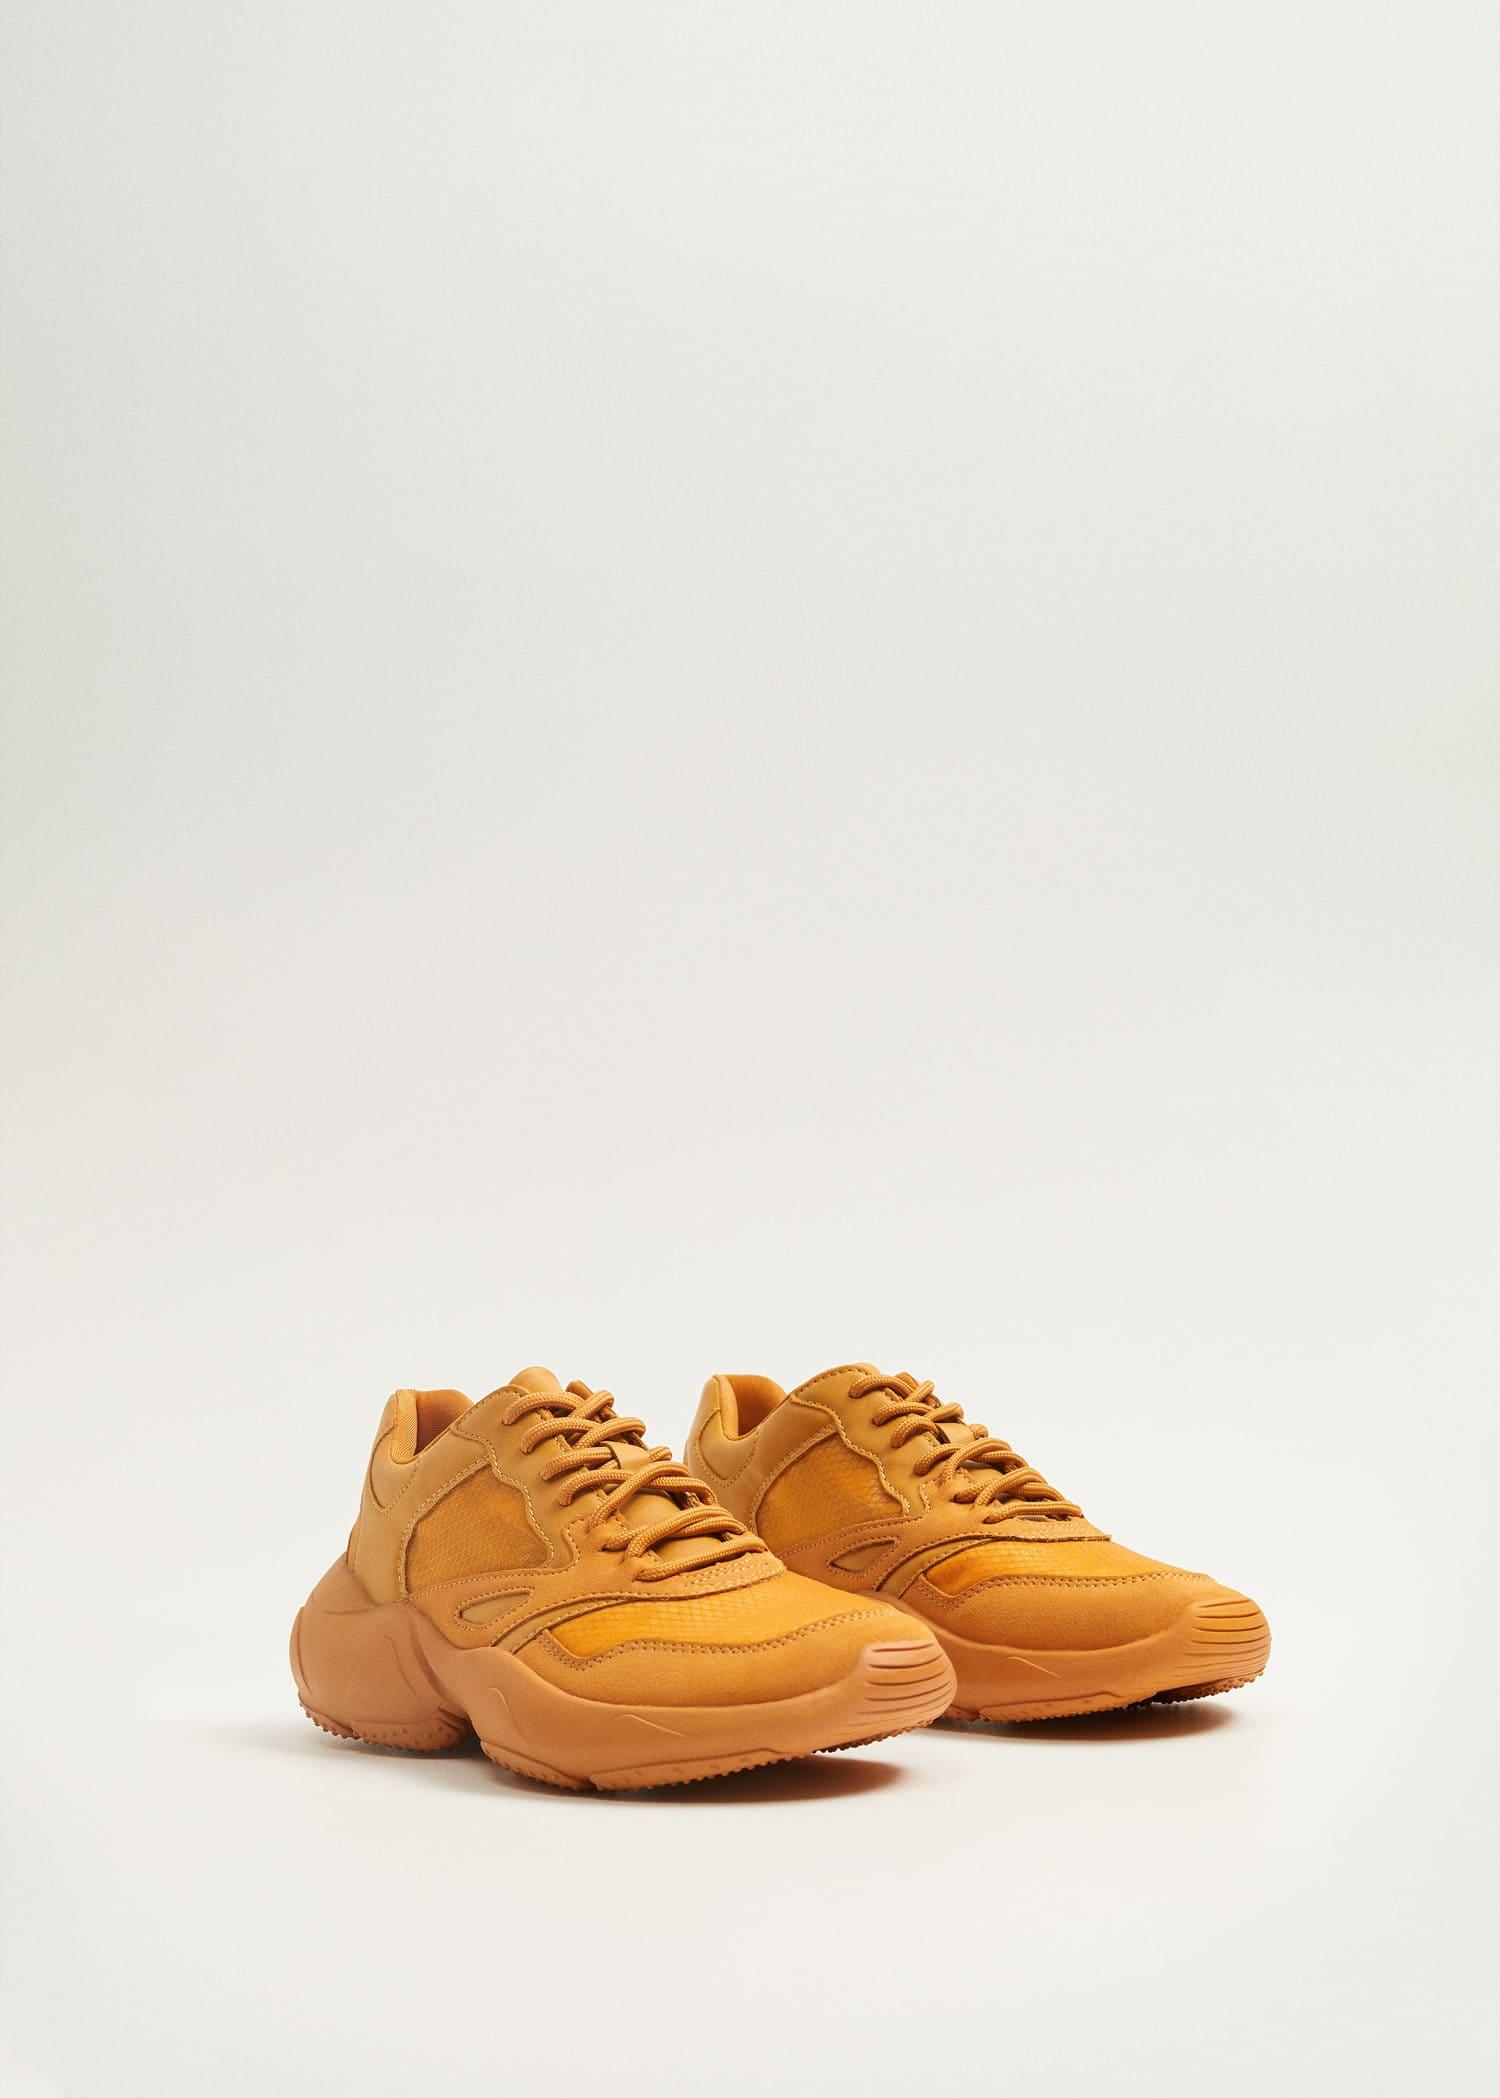 zapatillas asics hombre vestir mango